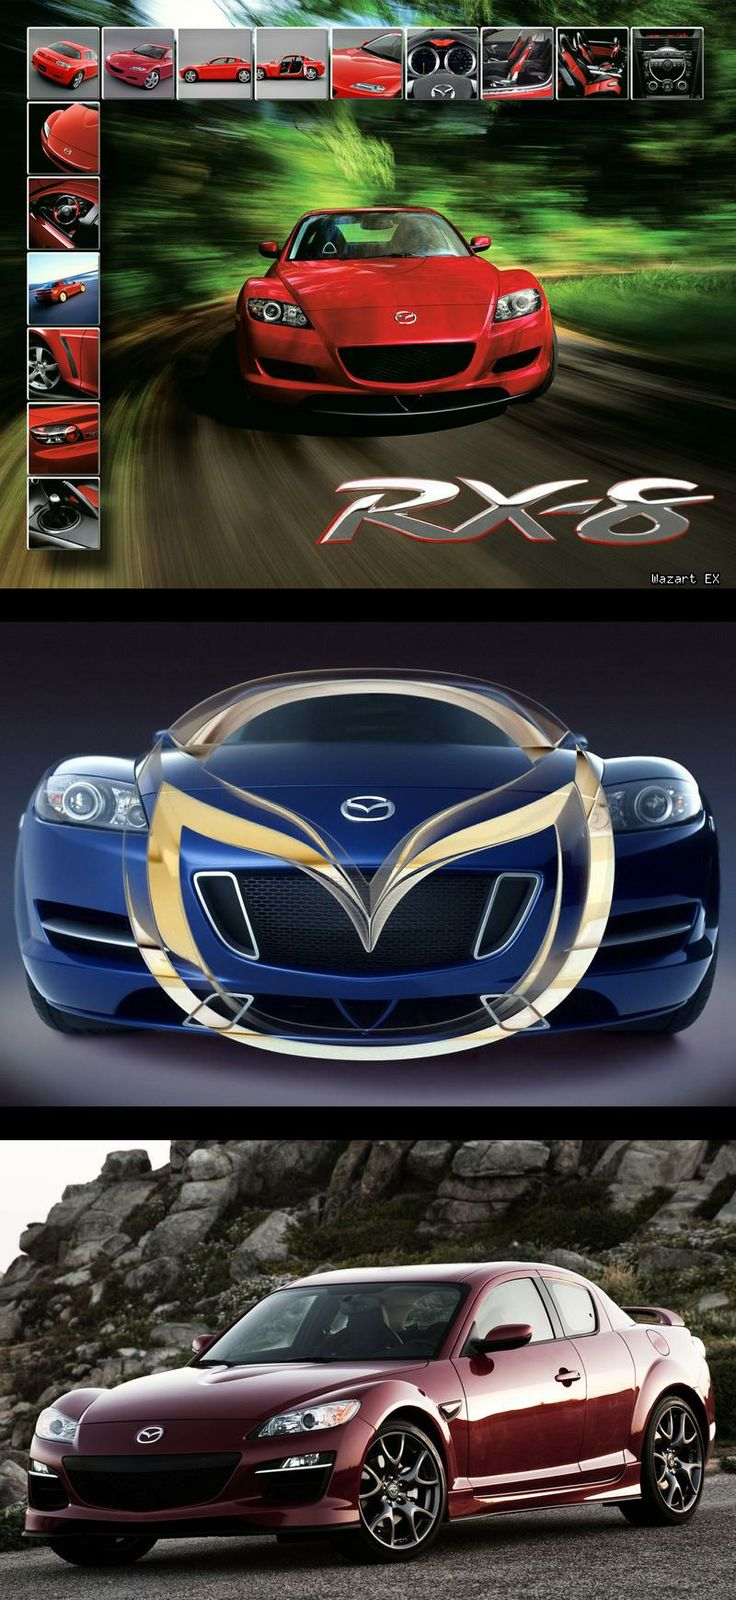 http://flanaganmotors.com Mazda RX8 poster